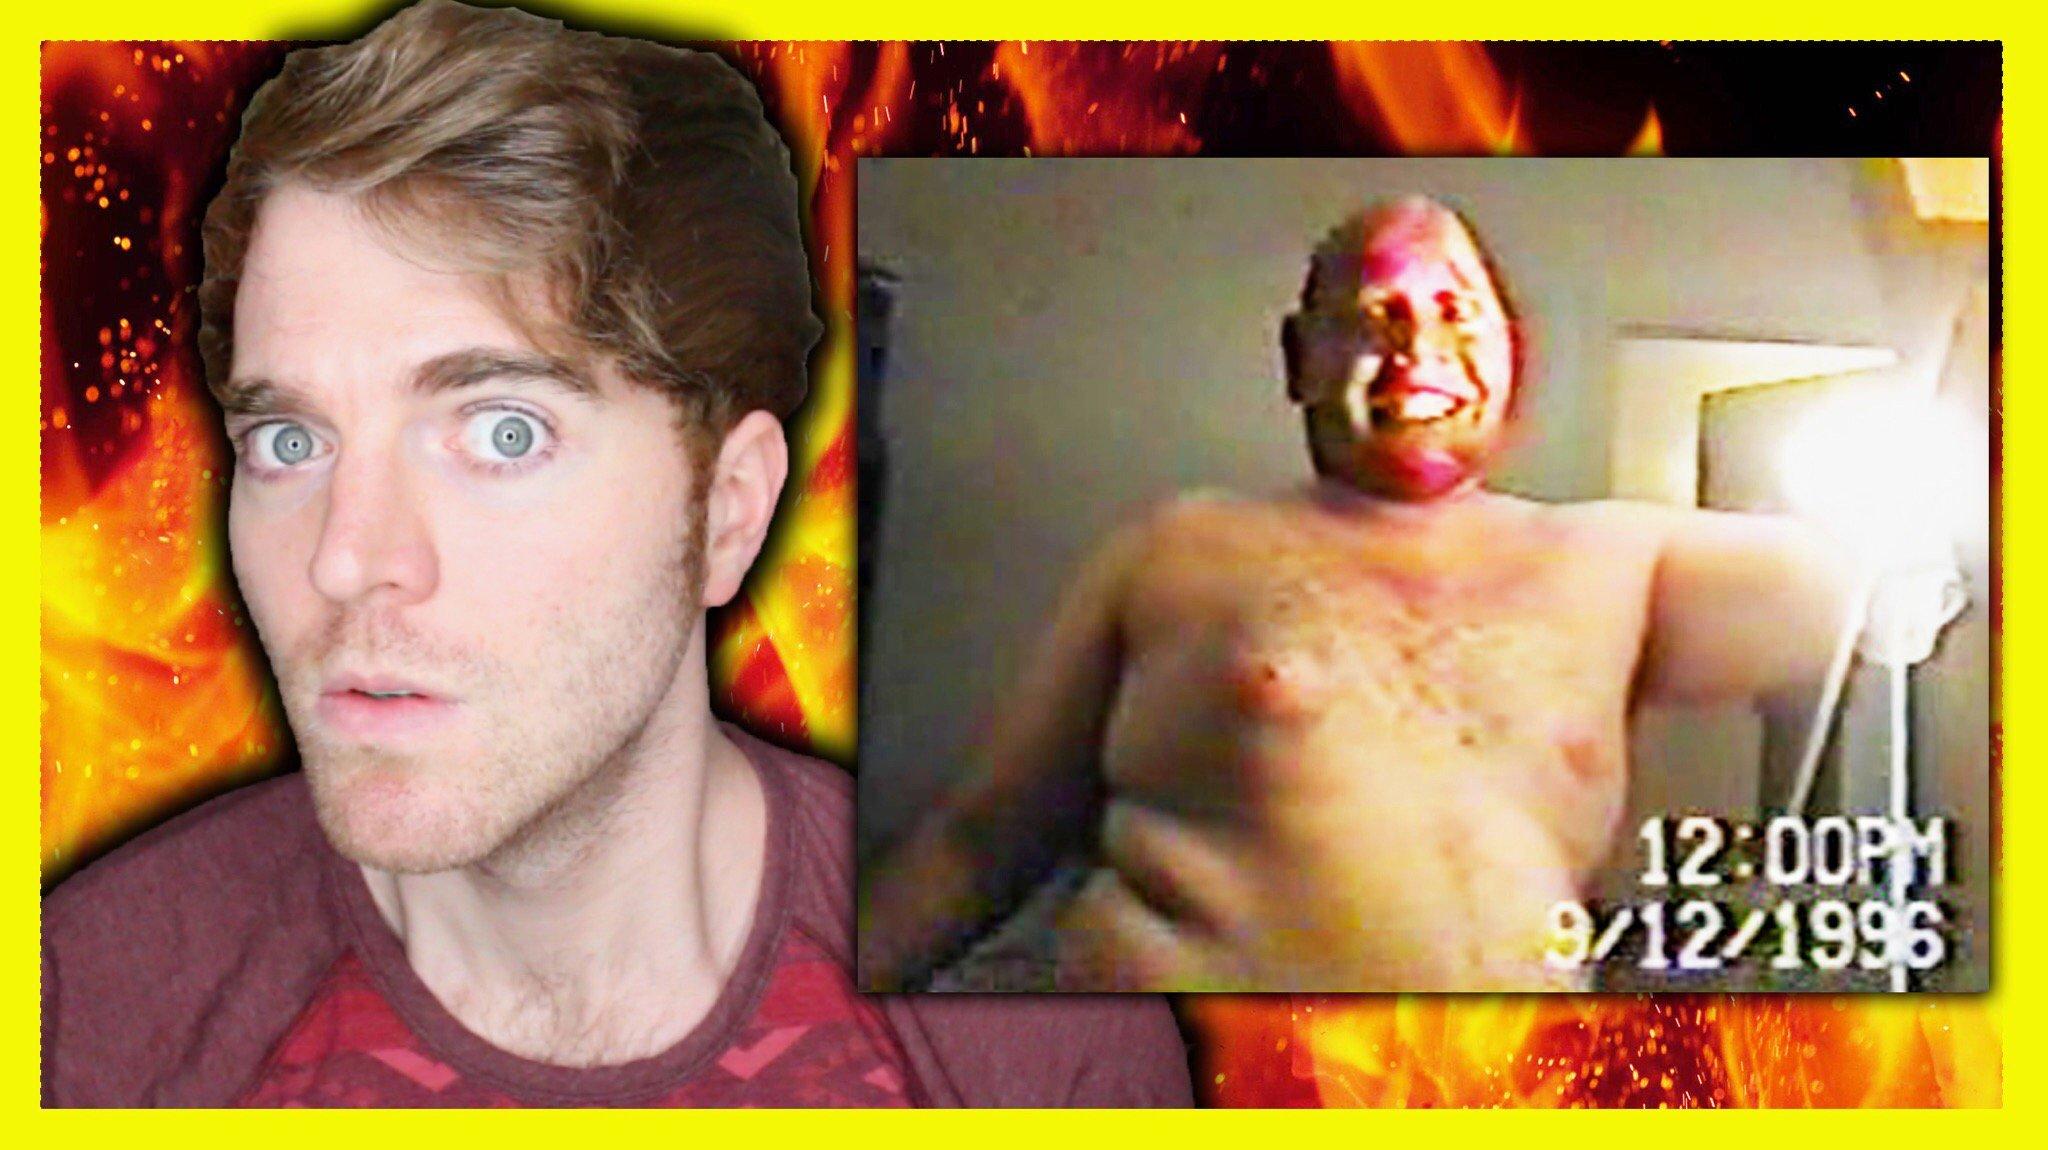 Shane Dawson On Twitter New Vid Scariest Videos On The Internet Https T Co Djzgprptdq Rt